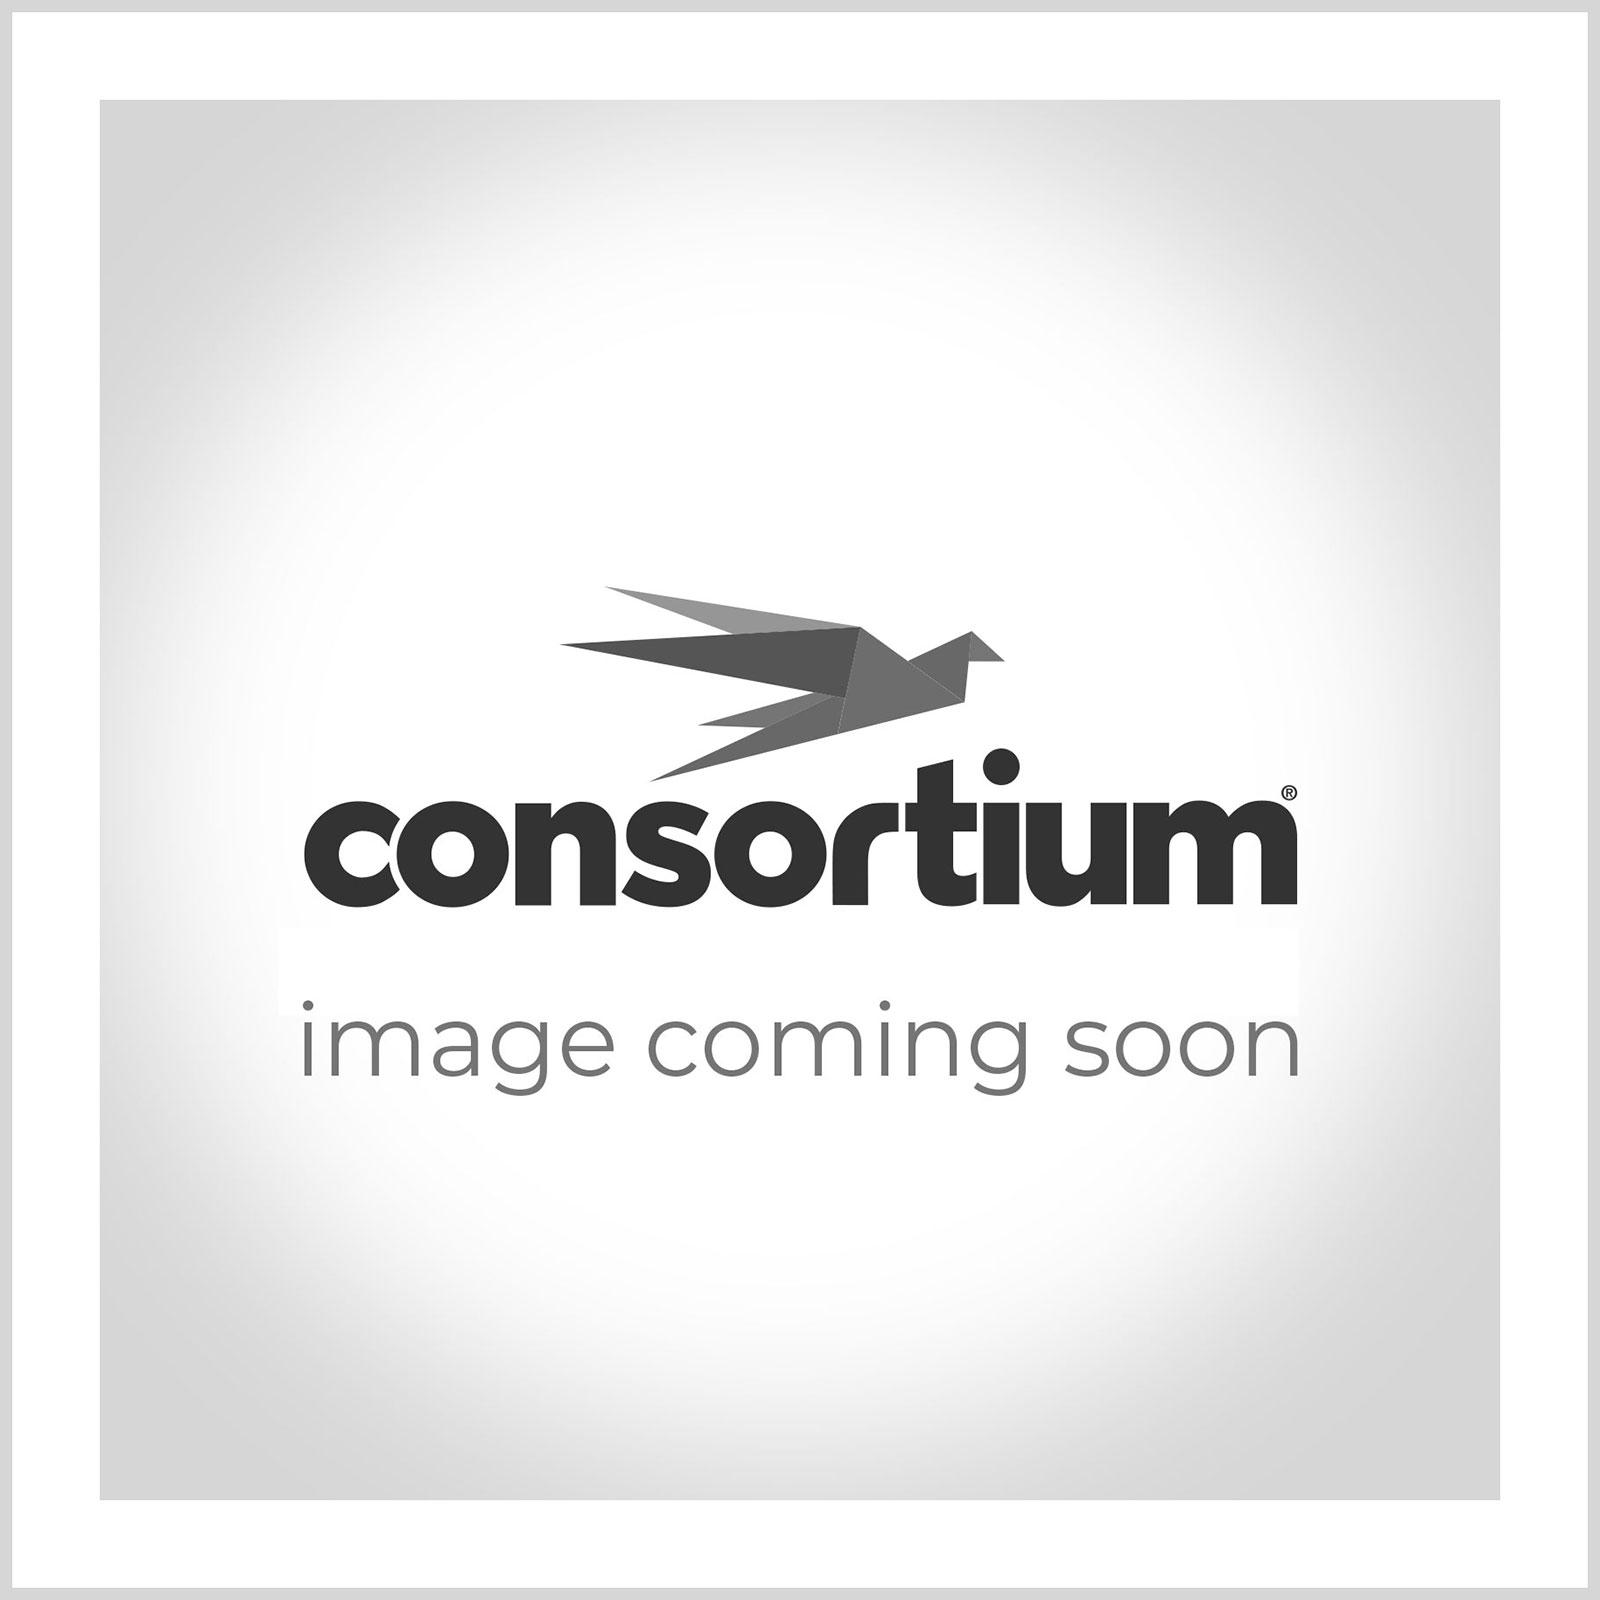 Spray PU Edge Crushbent Frame Rectangular Tables 1100mm(w) x 550mm(d)